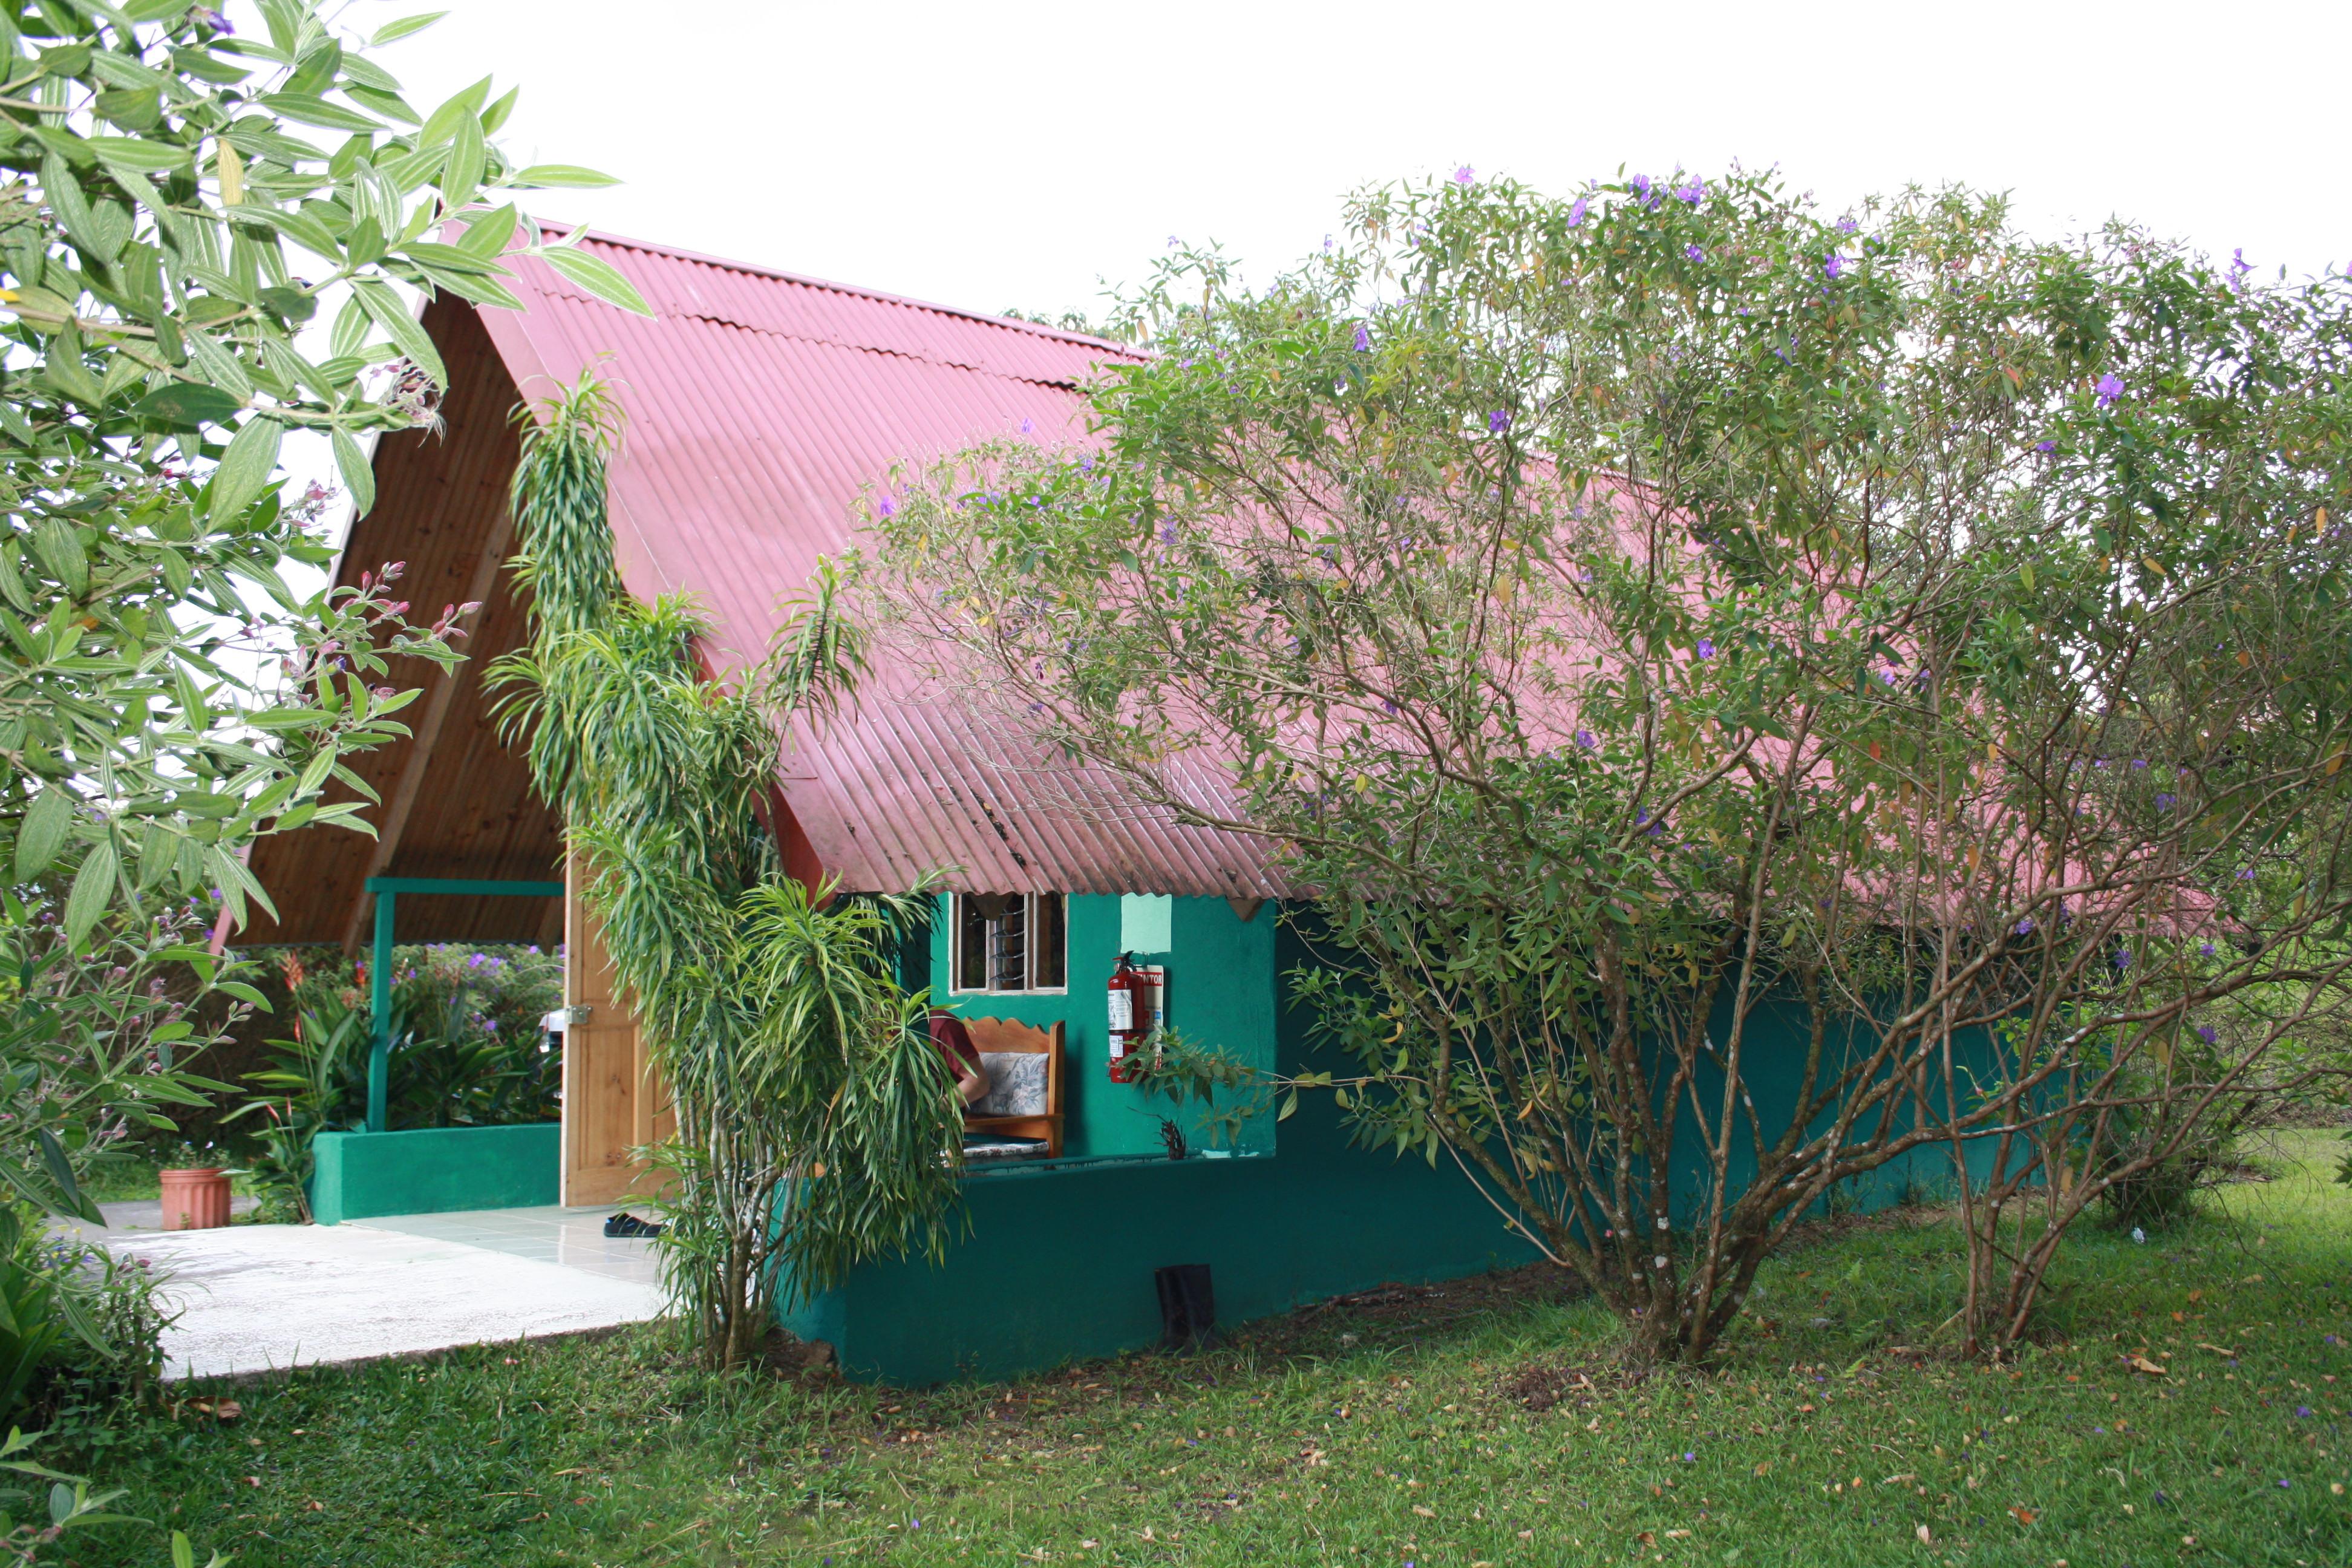 notre hébergement chez José au milieu de la jungle( costa Rica)